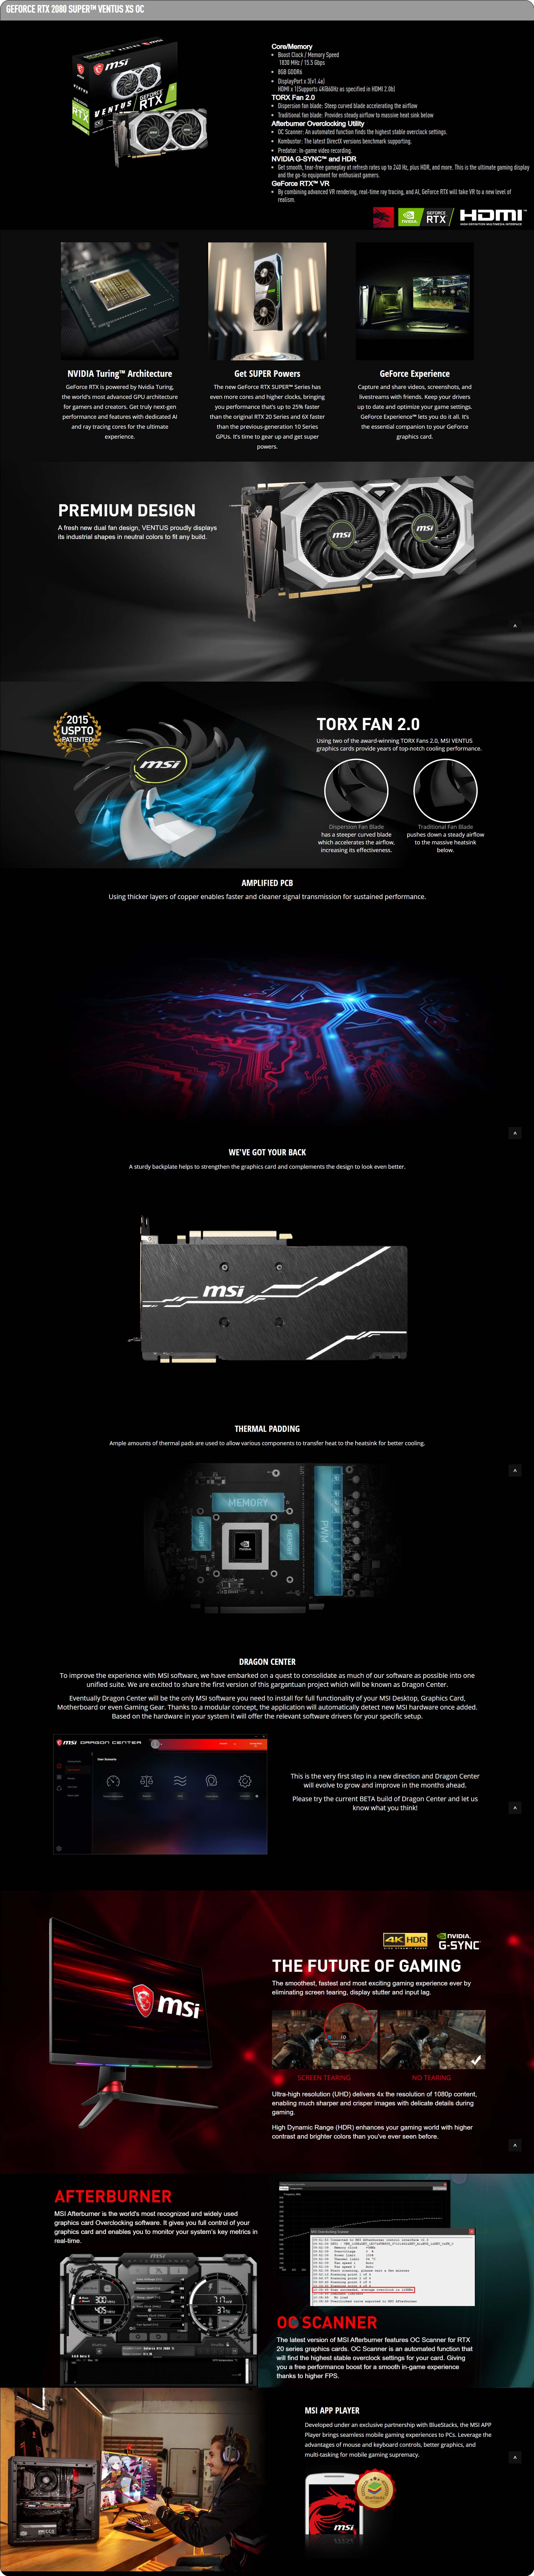 MSI GEFORCE RTX 2080 SUPER VENTUS XS OC graphics card - Description